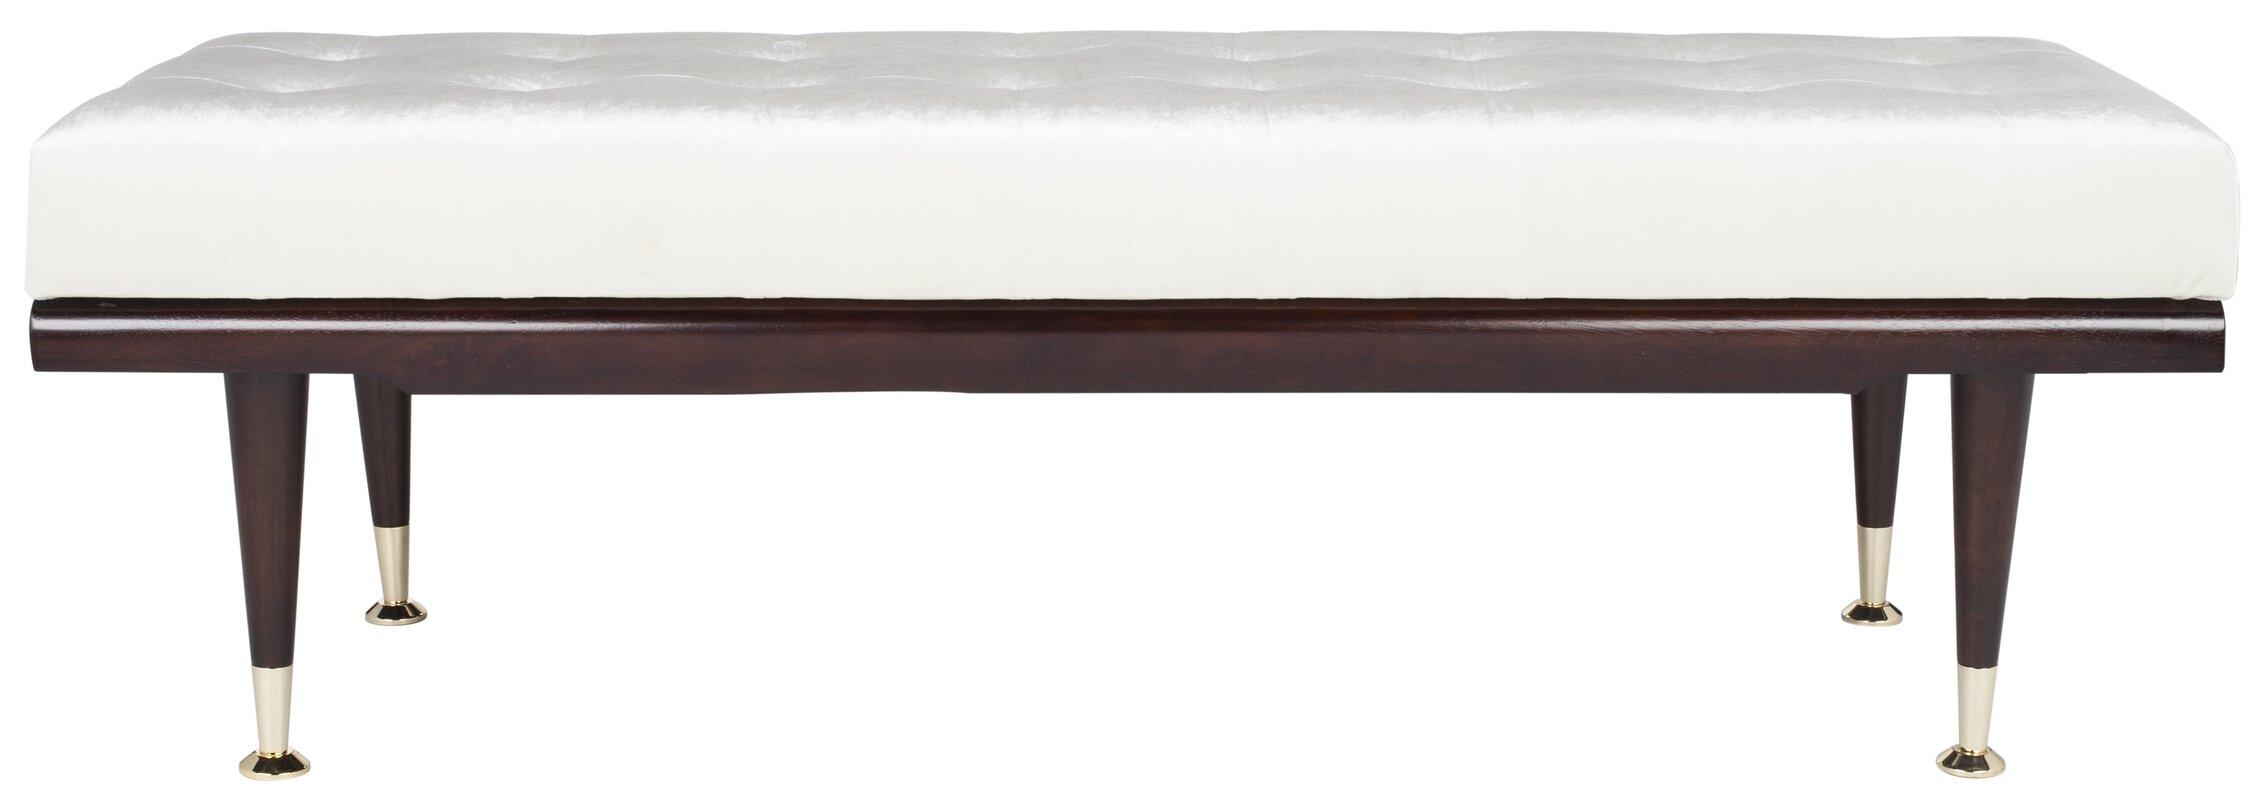 safavieh gepolsterte schlafzimmerbank sofia. Black Bedroom Furniture Sets. Home Design Ideas